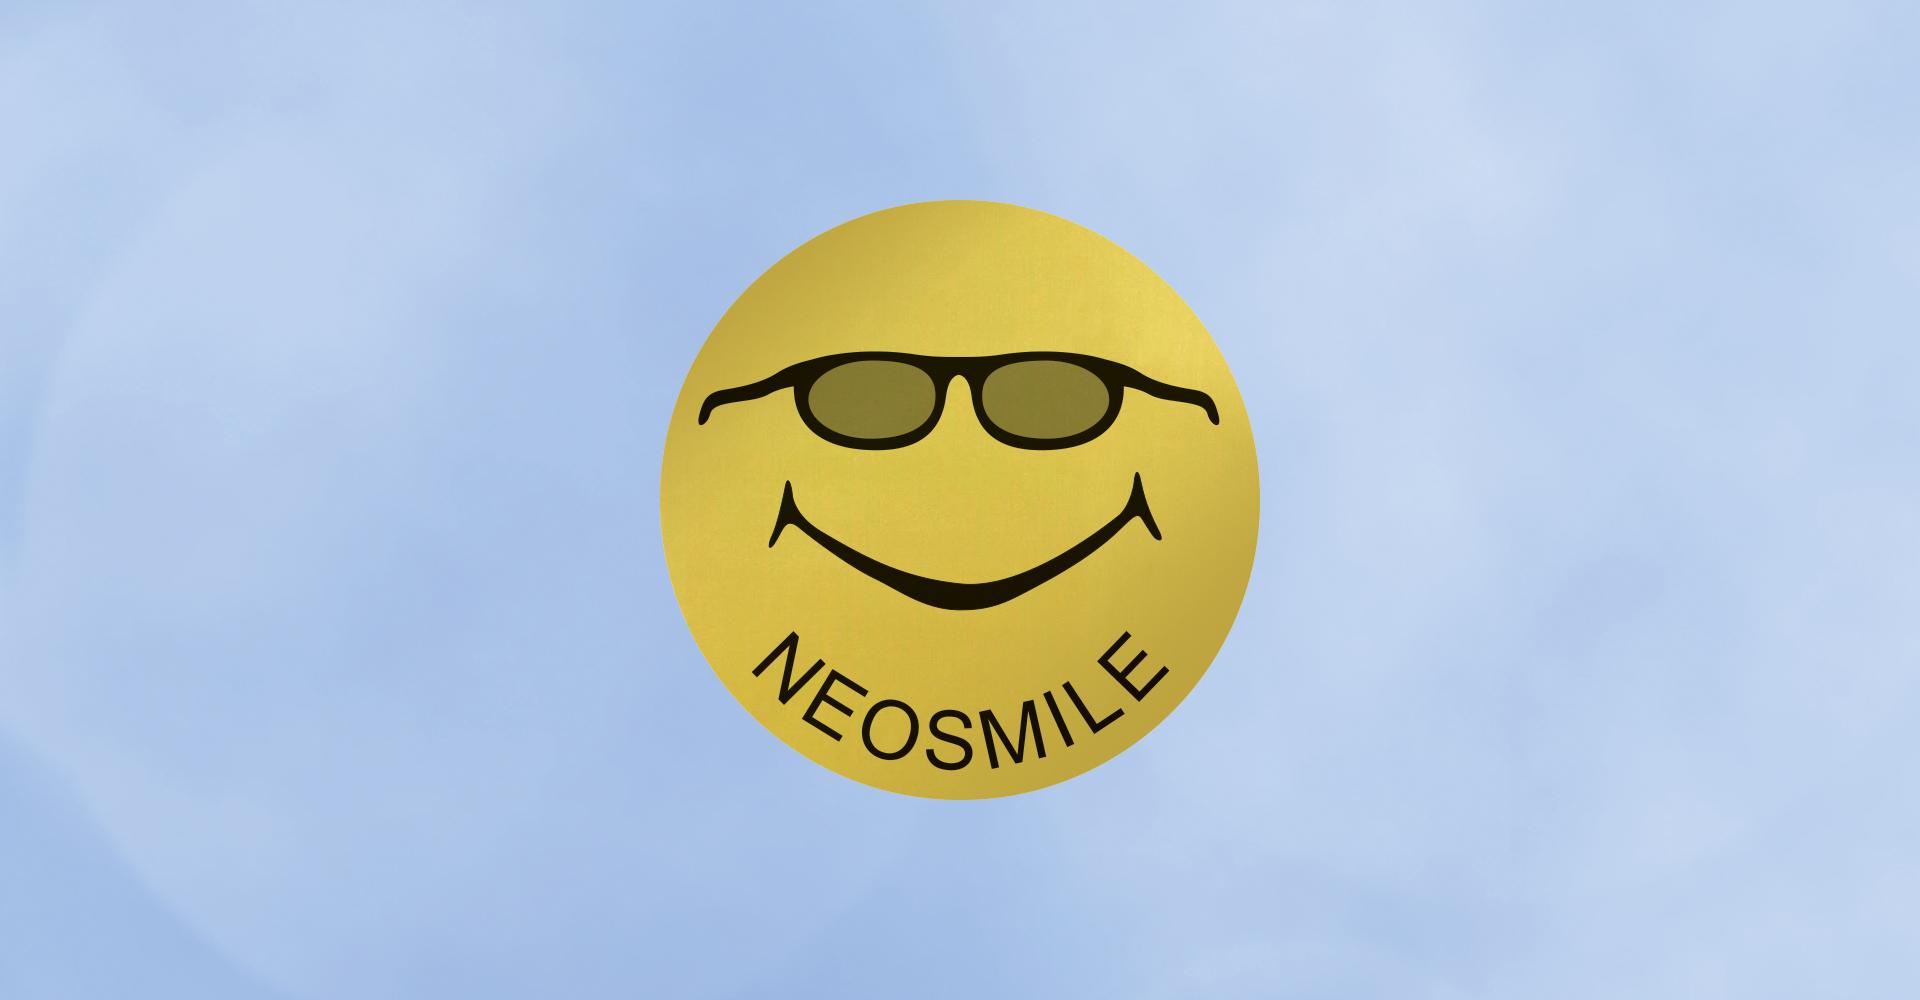 NeoSmile™